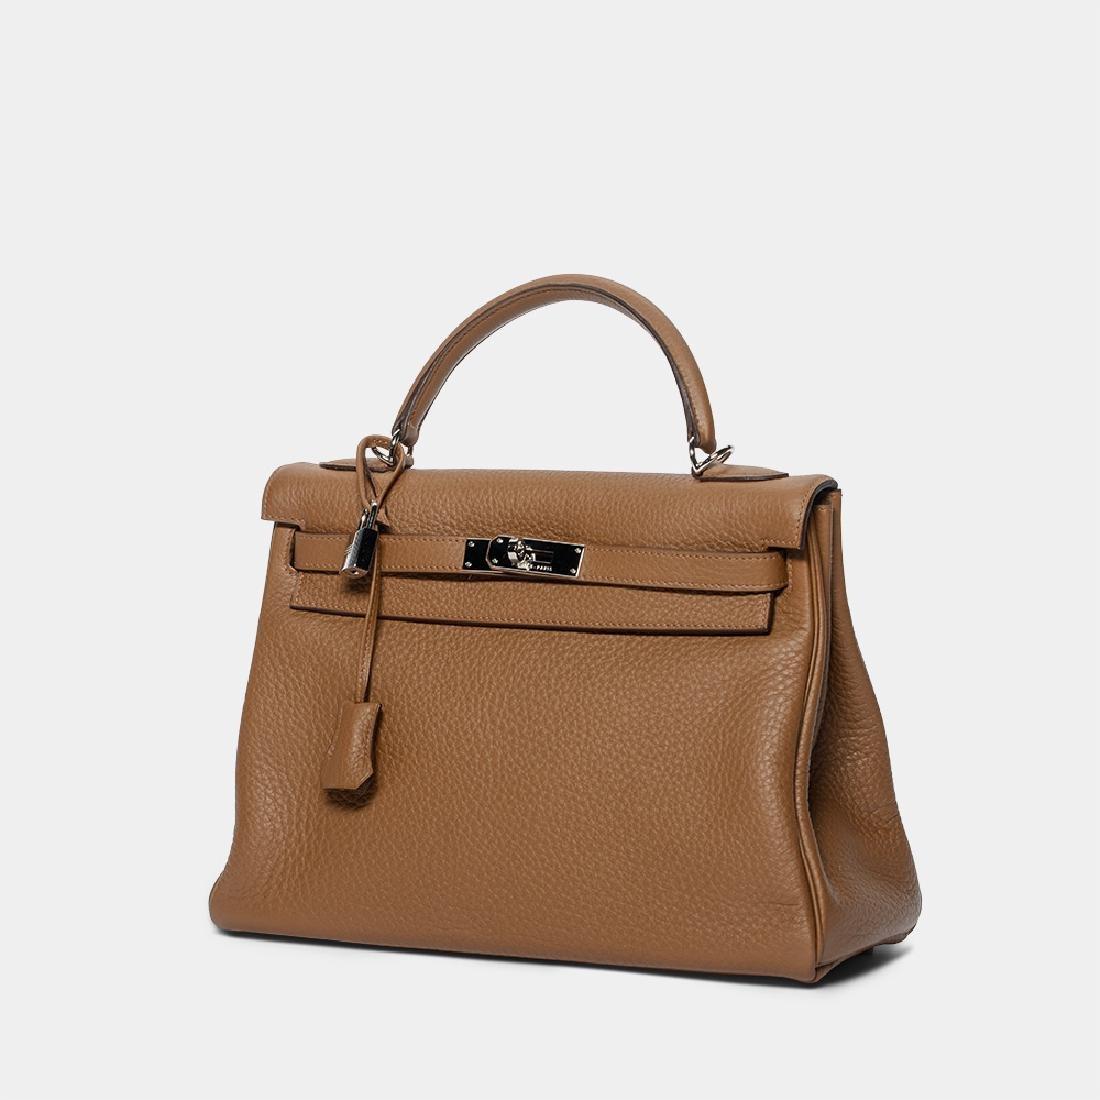 "HERMÈS beliebte Stil-Ikonen Handtasche ""RETOURNE KELLY - 3"